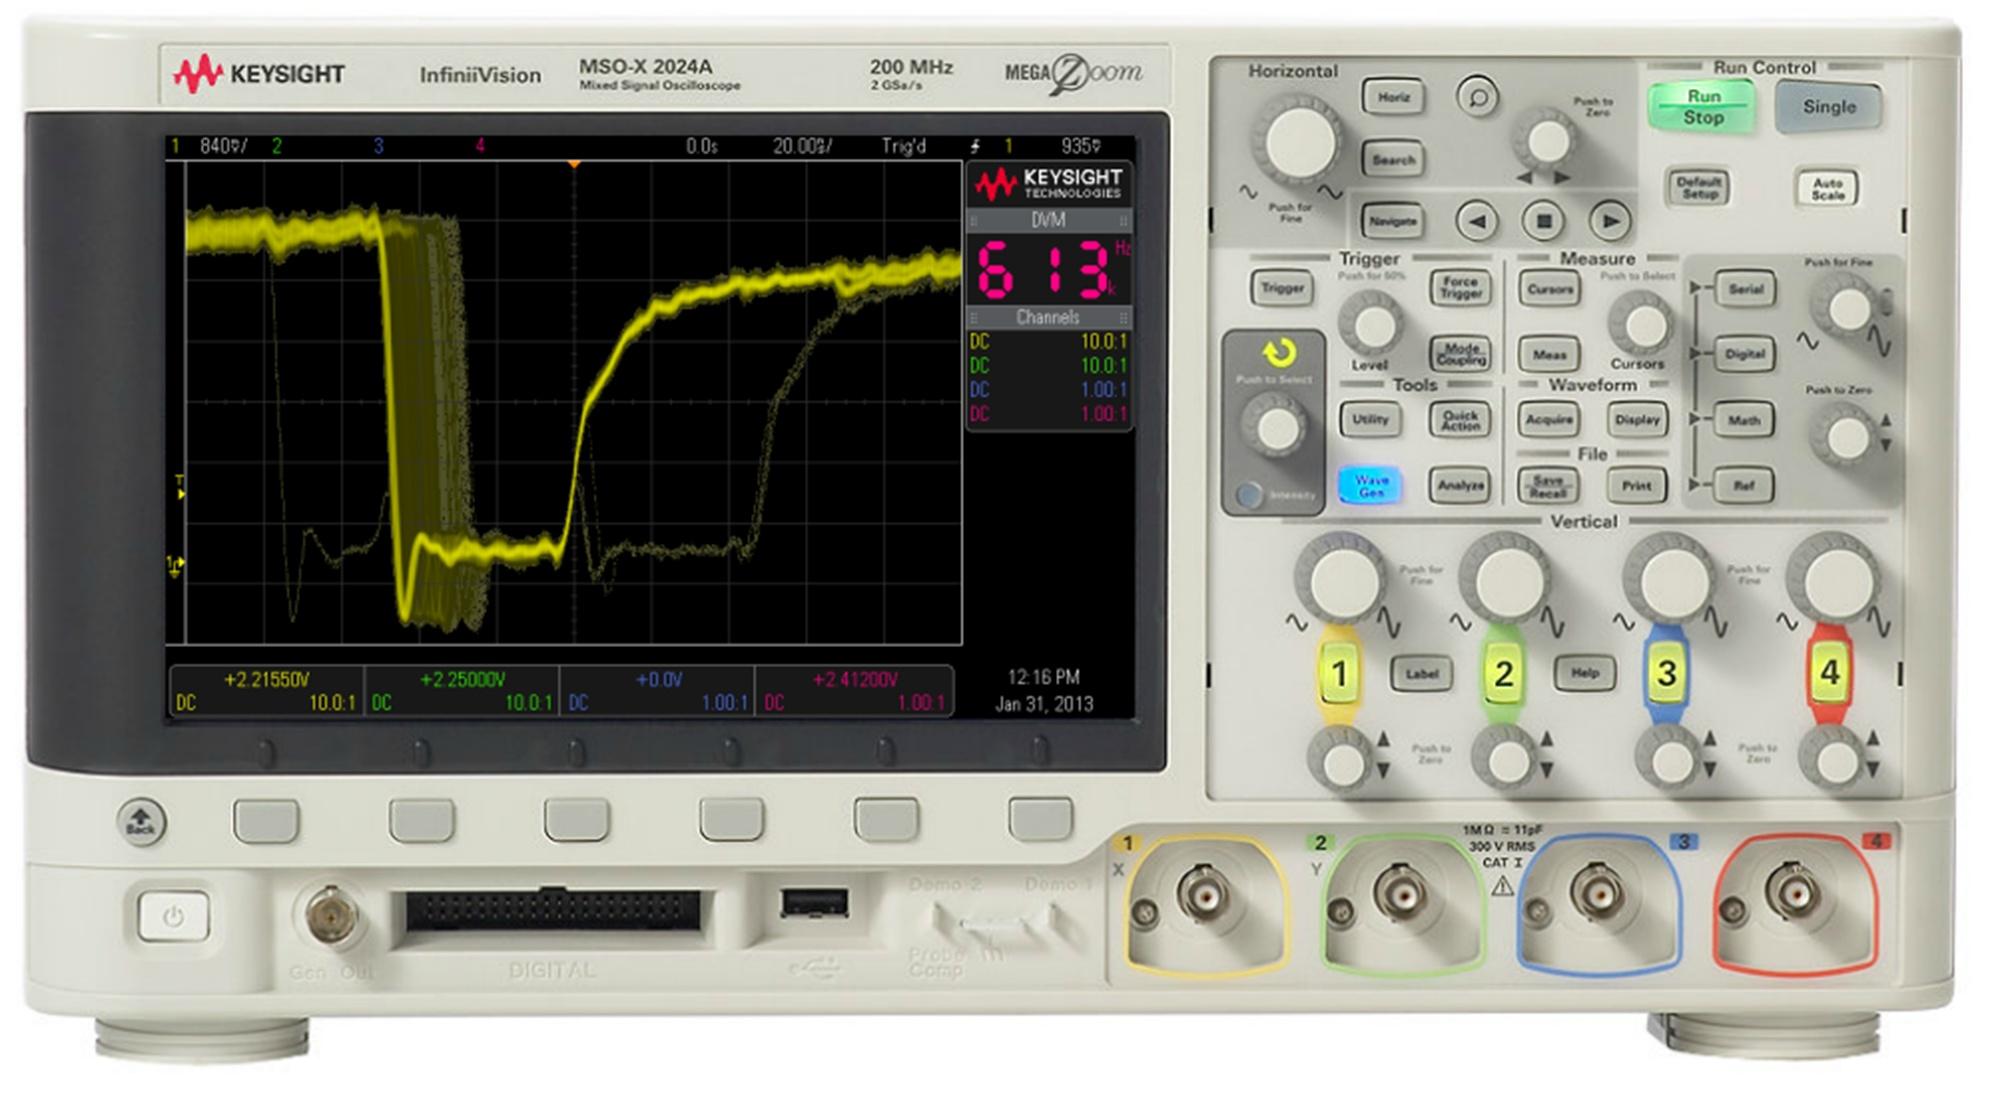 MSOX2012A Osiloskop: 100 MHz, 2 Analog  8 Dijital Kanal